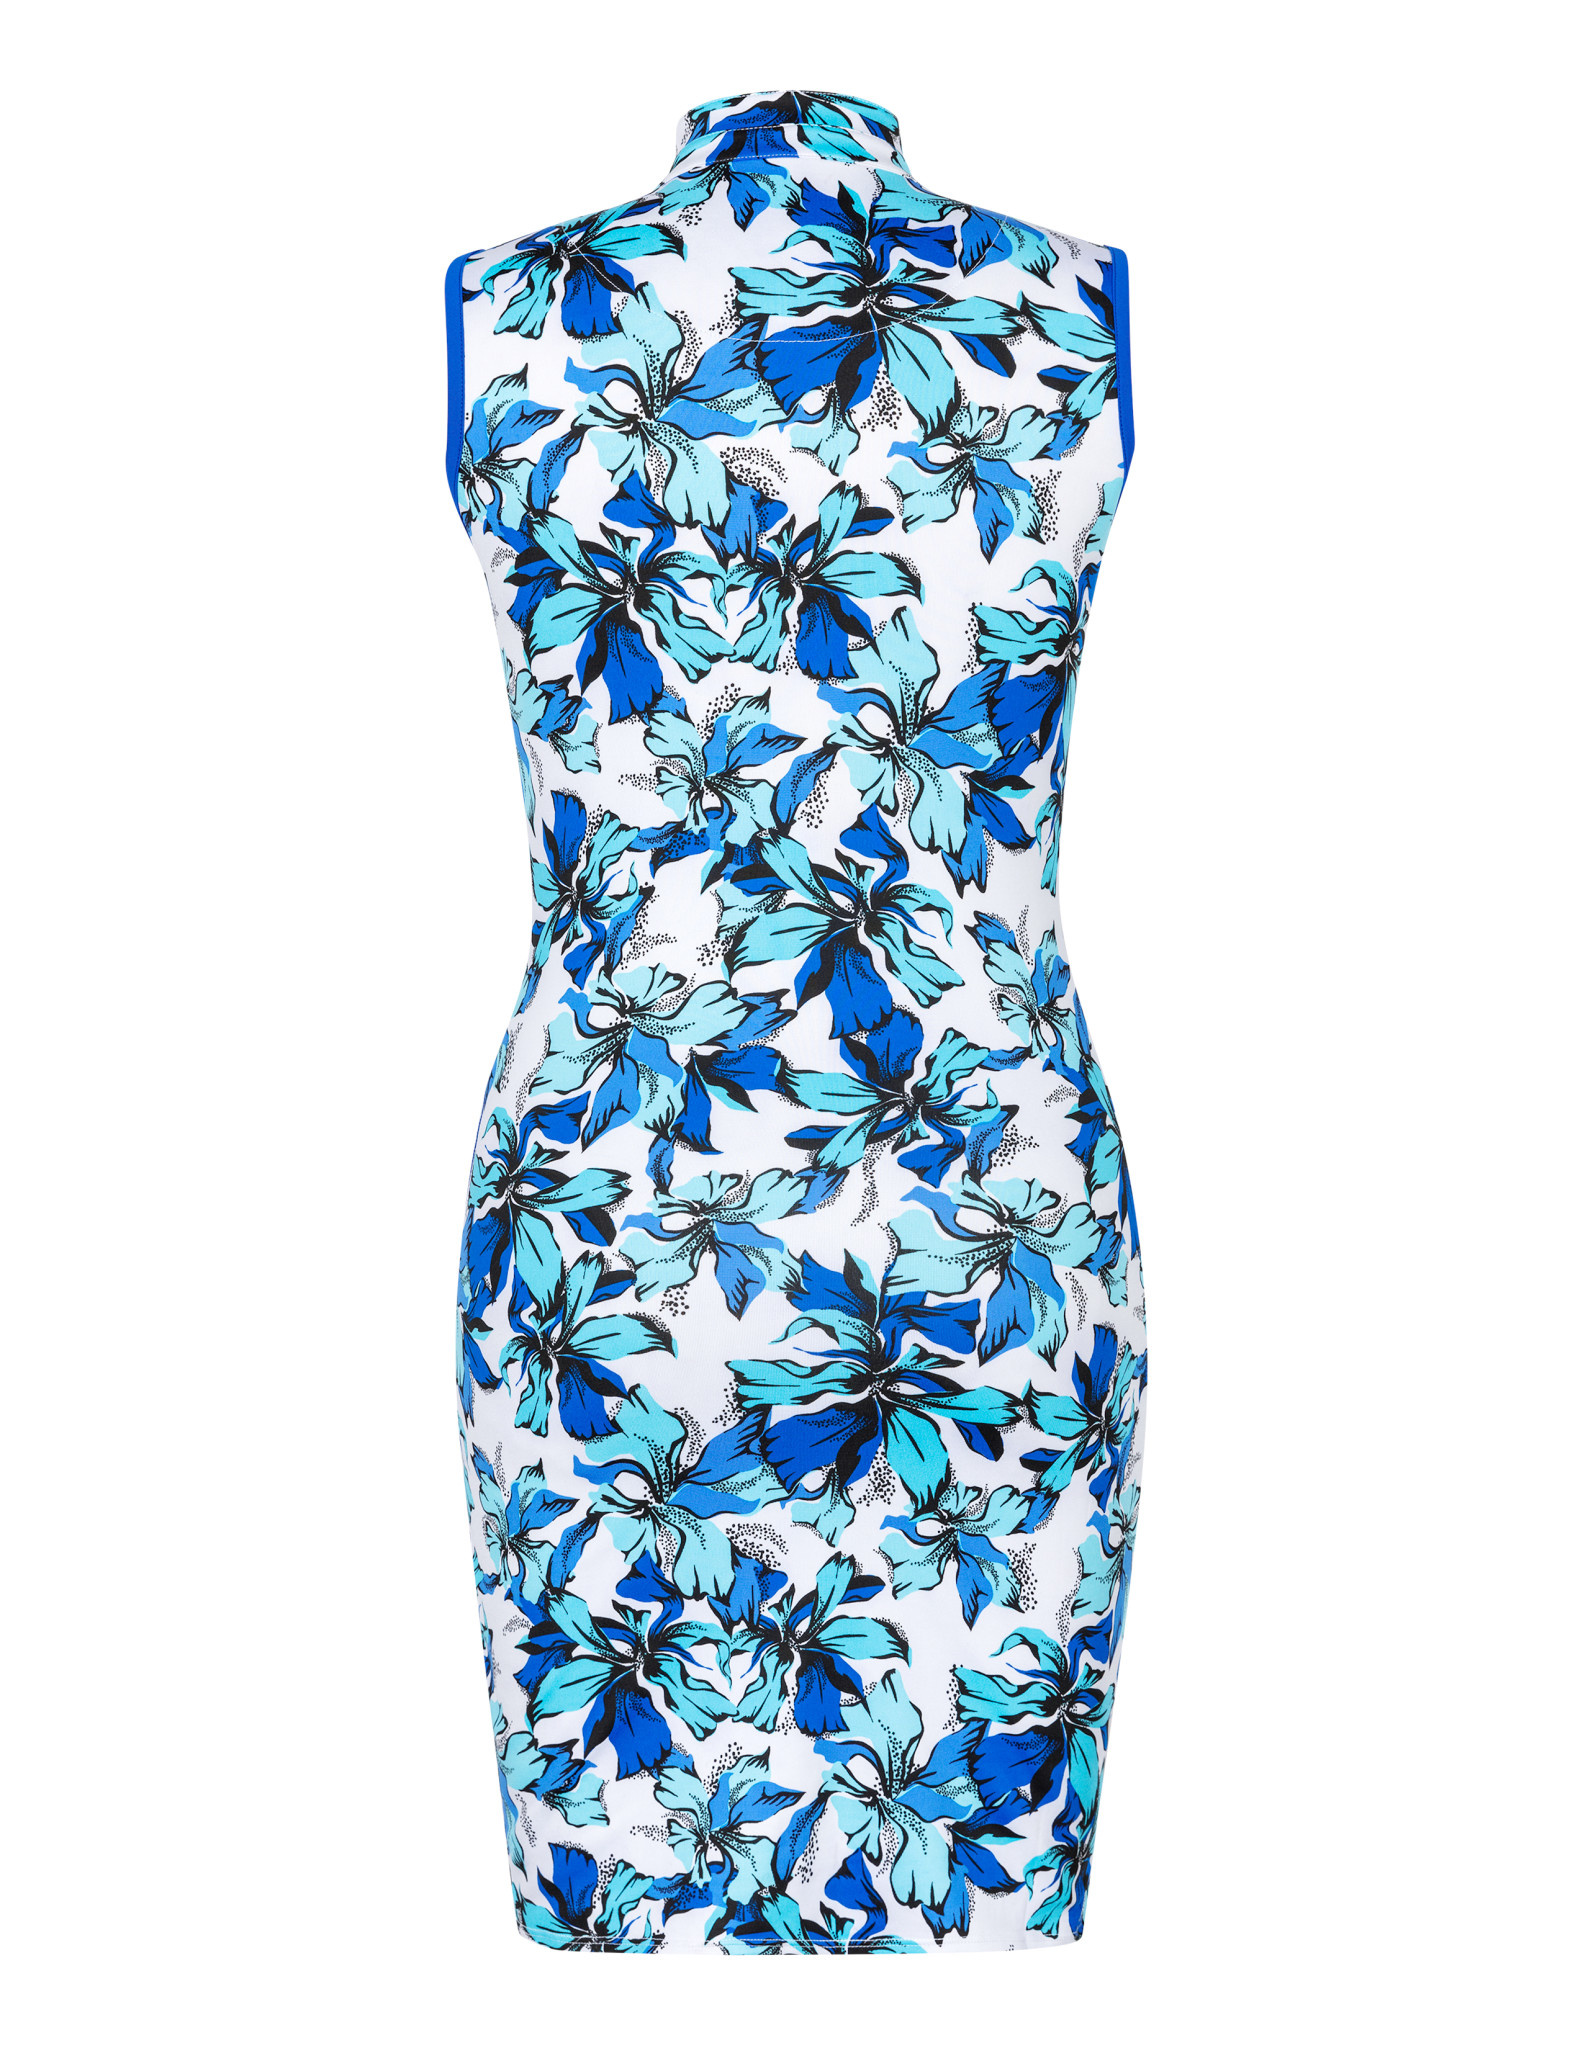 Tail Tail Gia Sleeveless Dress Lilies